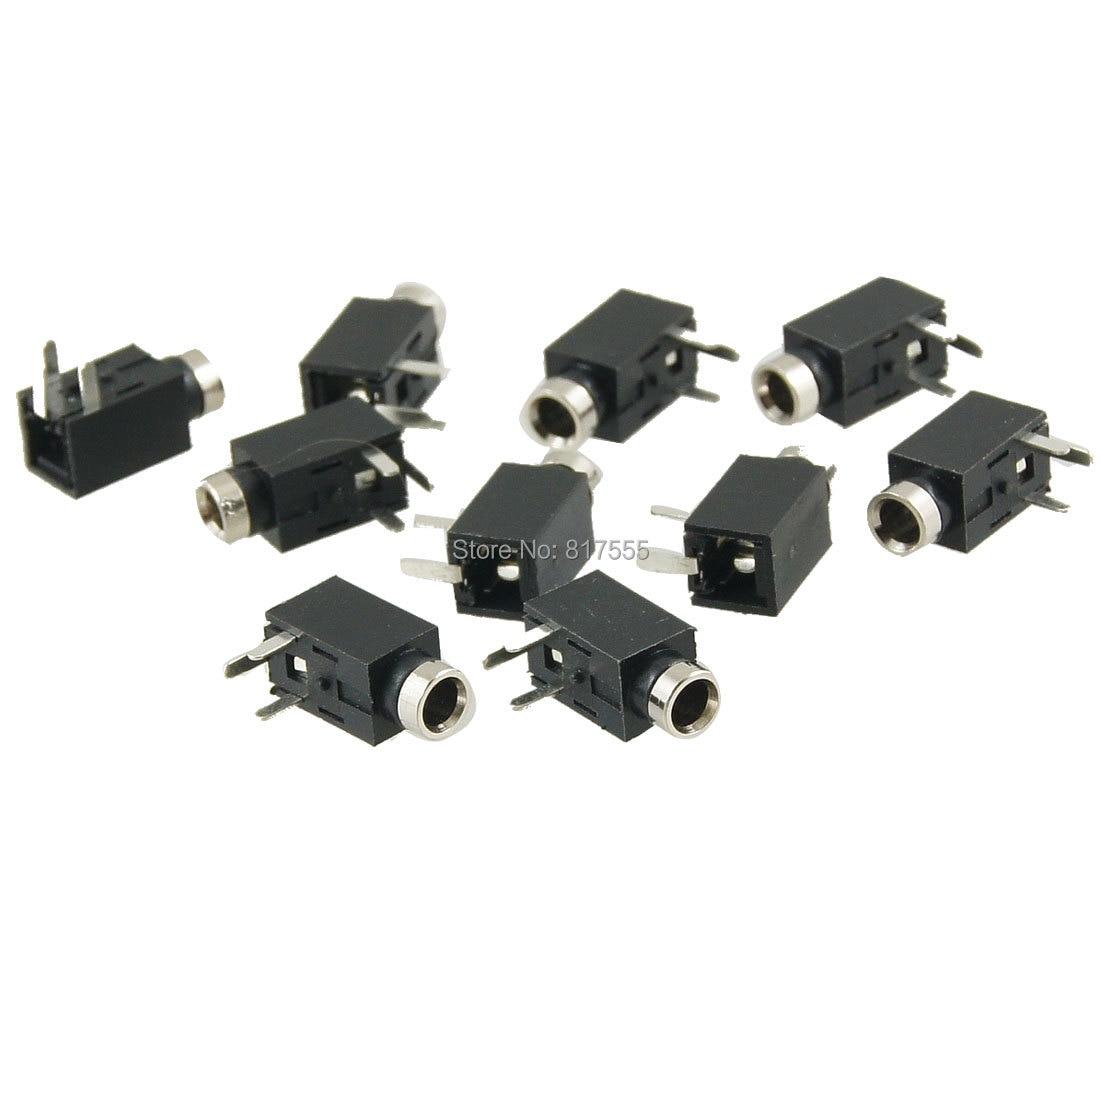 Trs Jack Wiring Diagram Mppt Charge Controller Circuit Female Xlr 3 5mm Elsavadorla